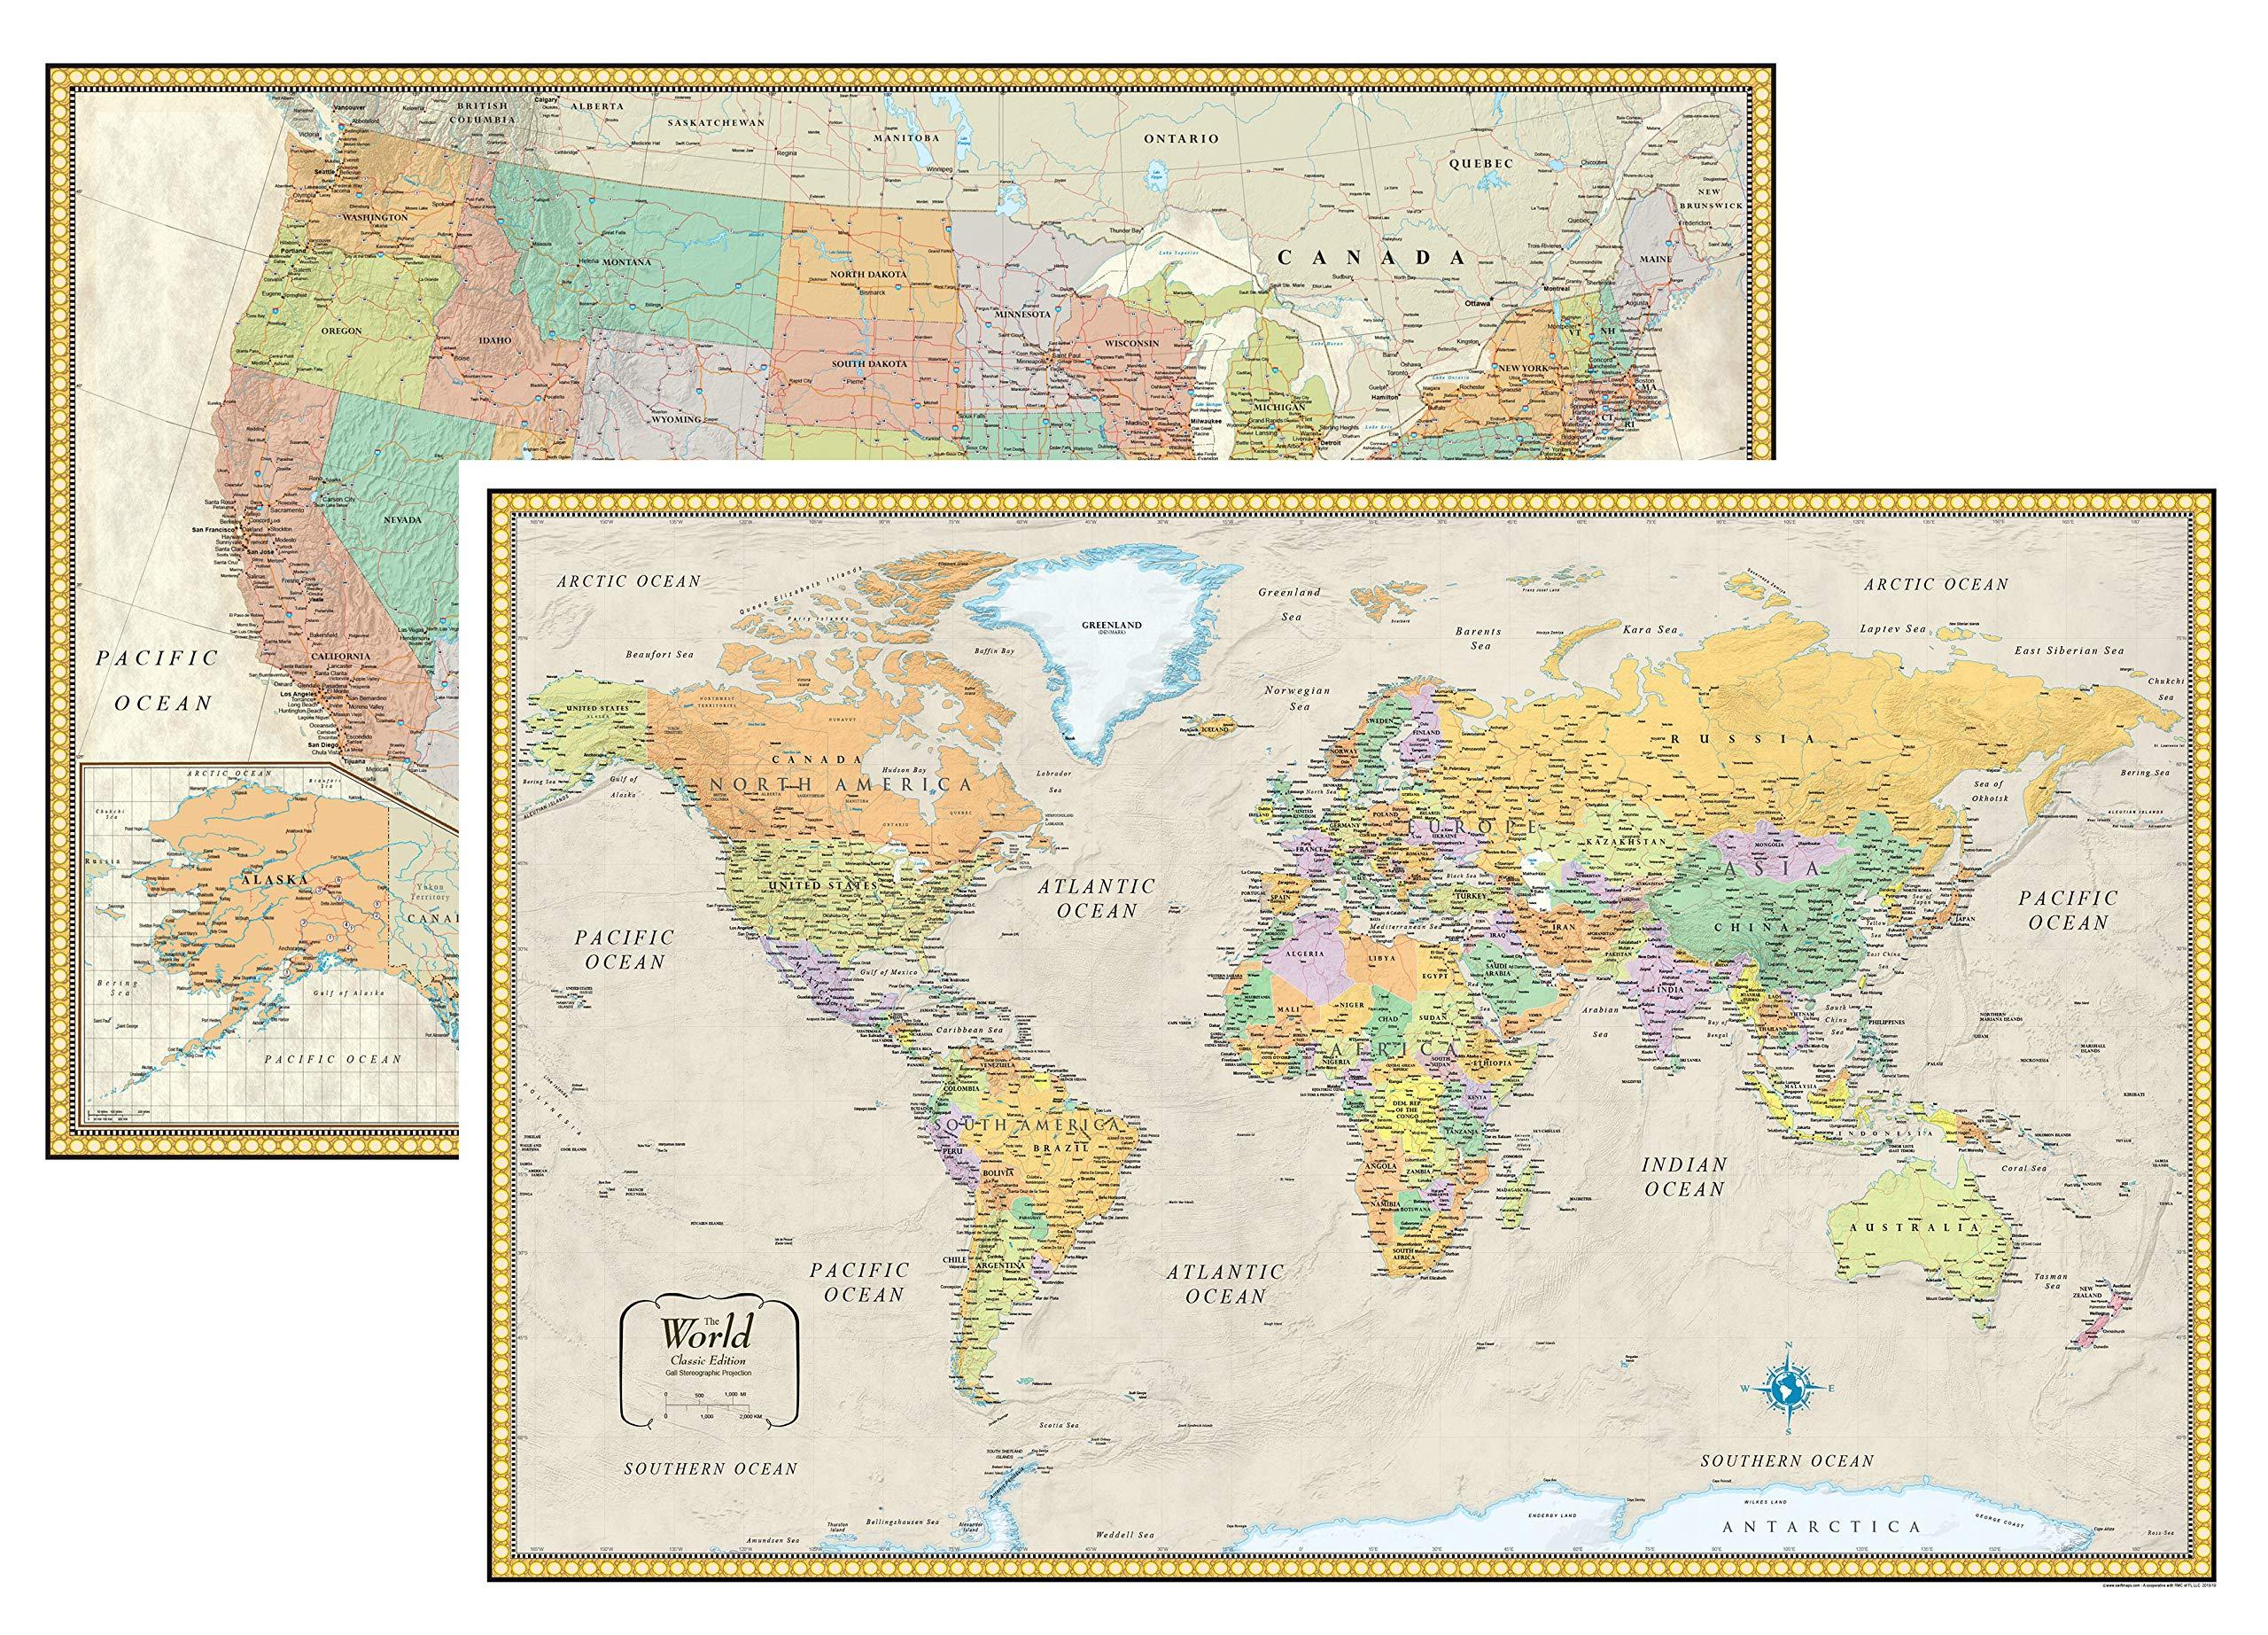 RMC Classic United States USA and World Wall Map Set (Laminated) by Swiftmaps